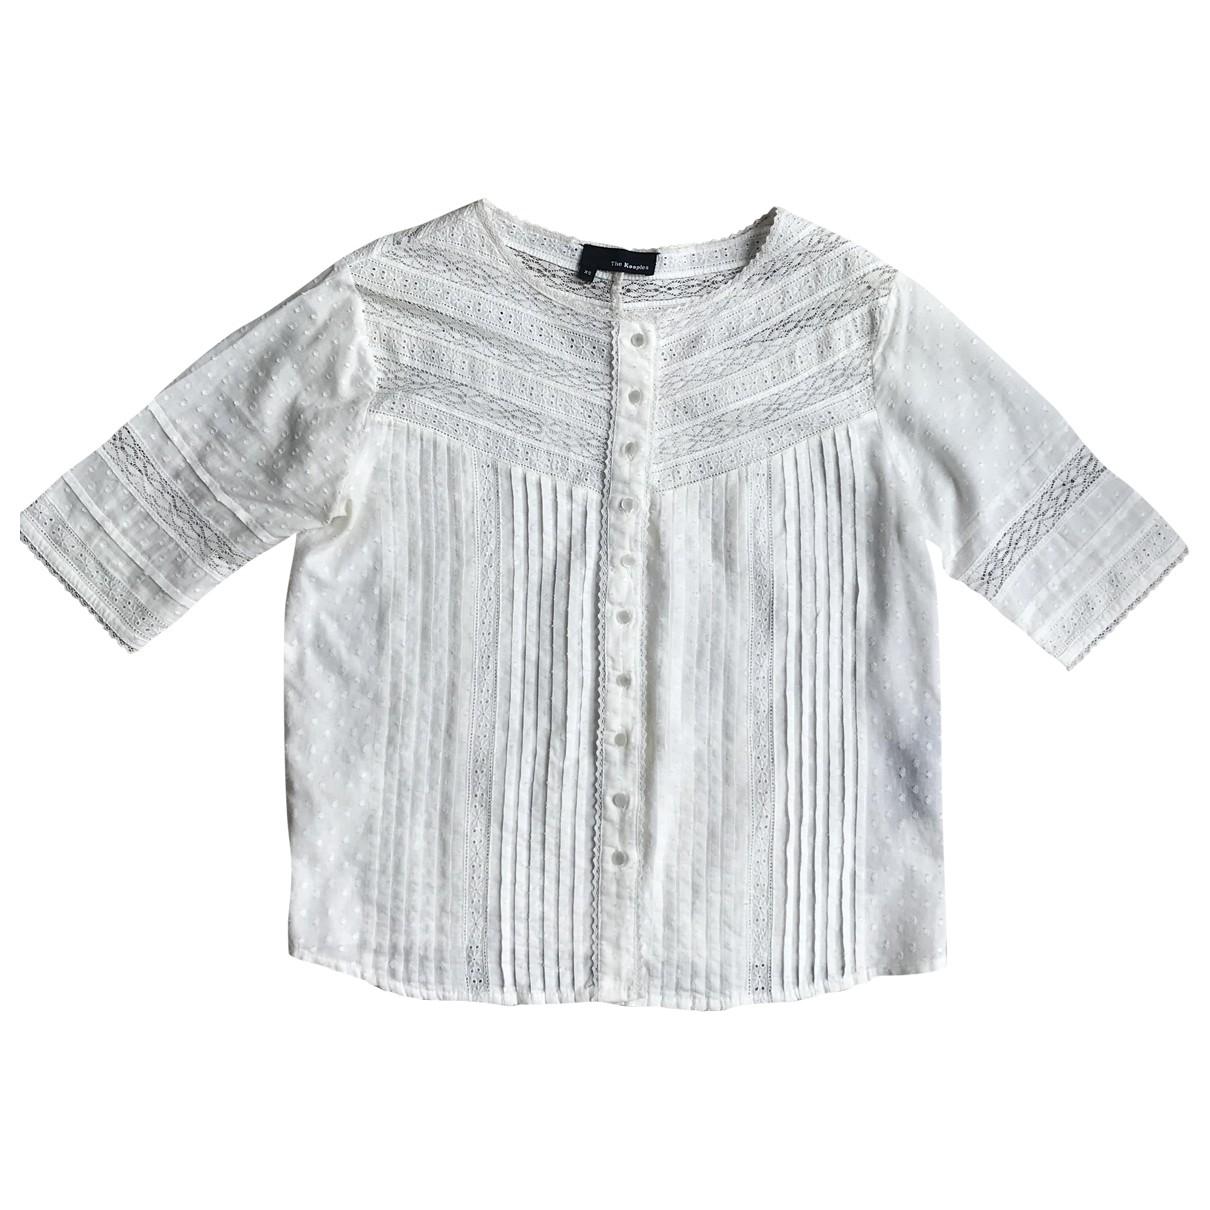 The Kooples \N Beige Cotton  top for Women XS International